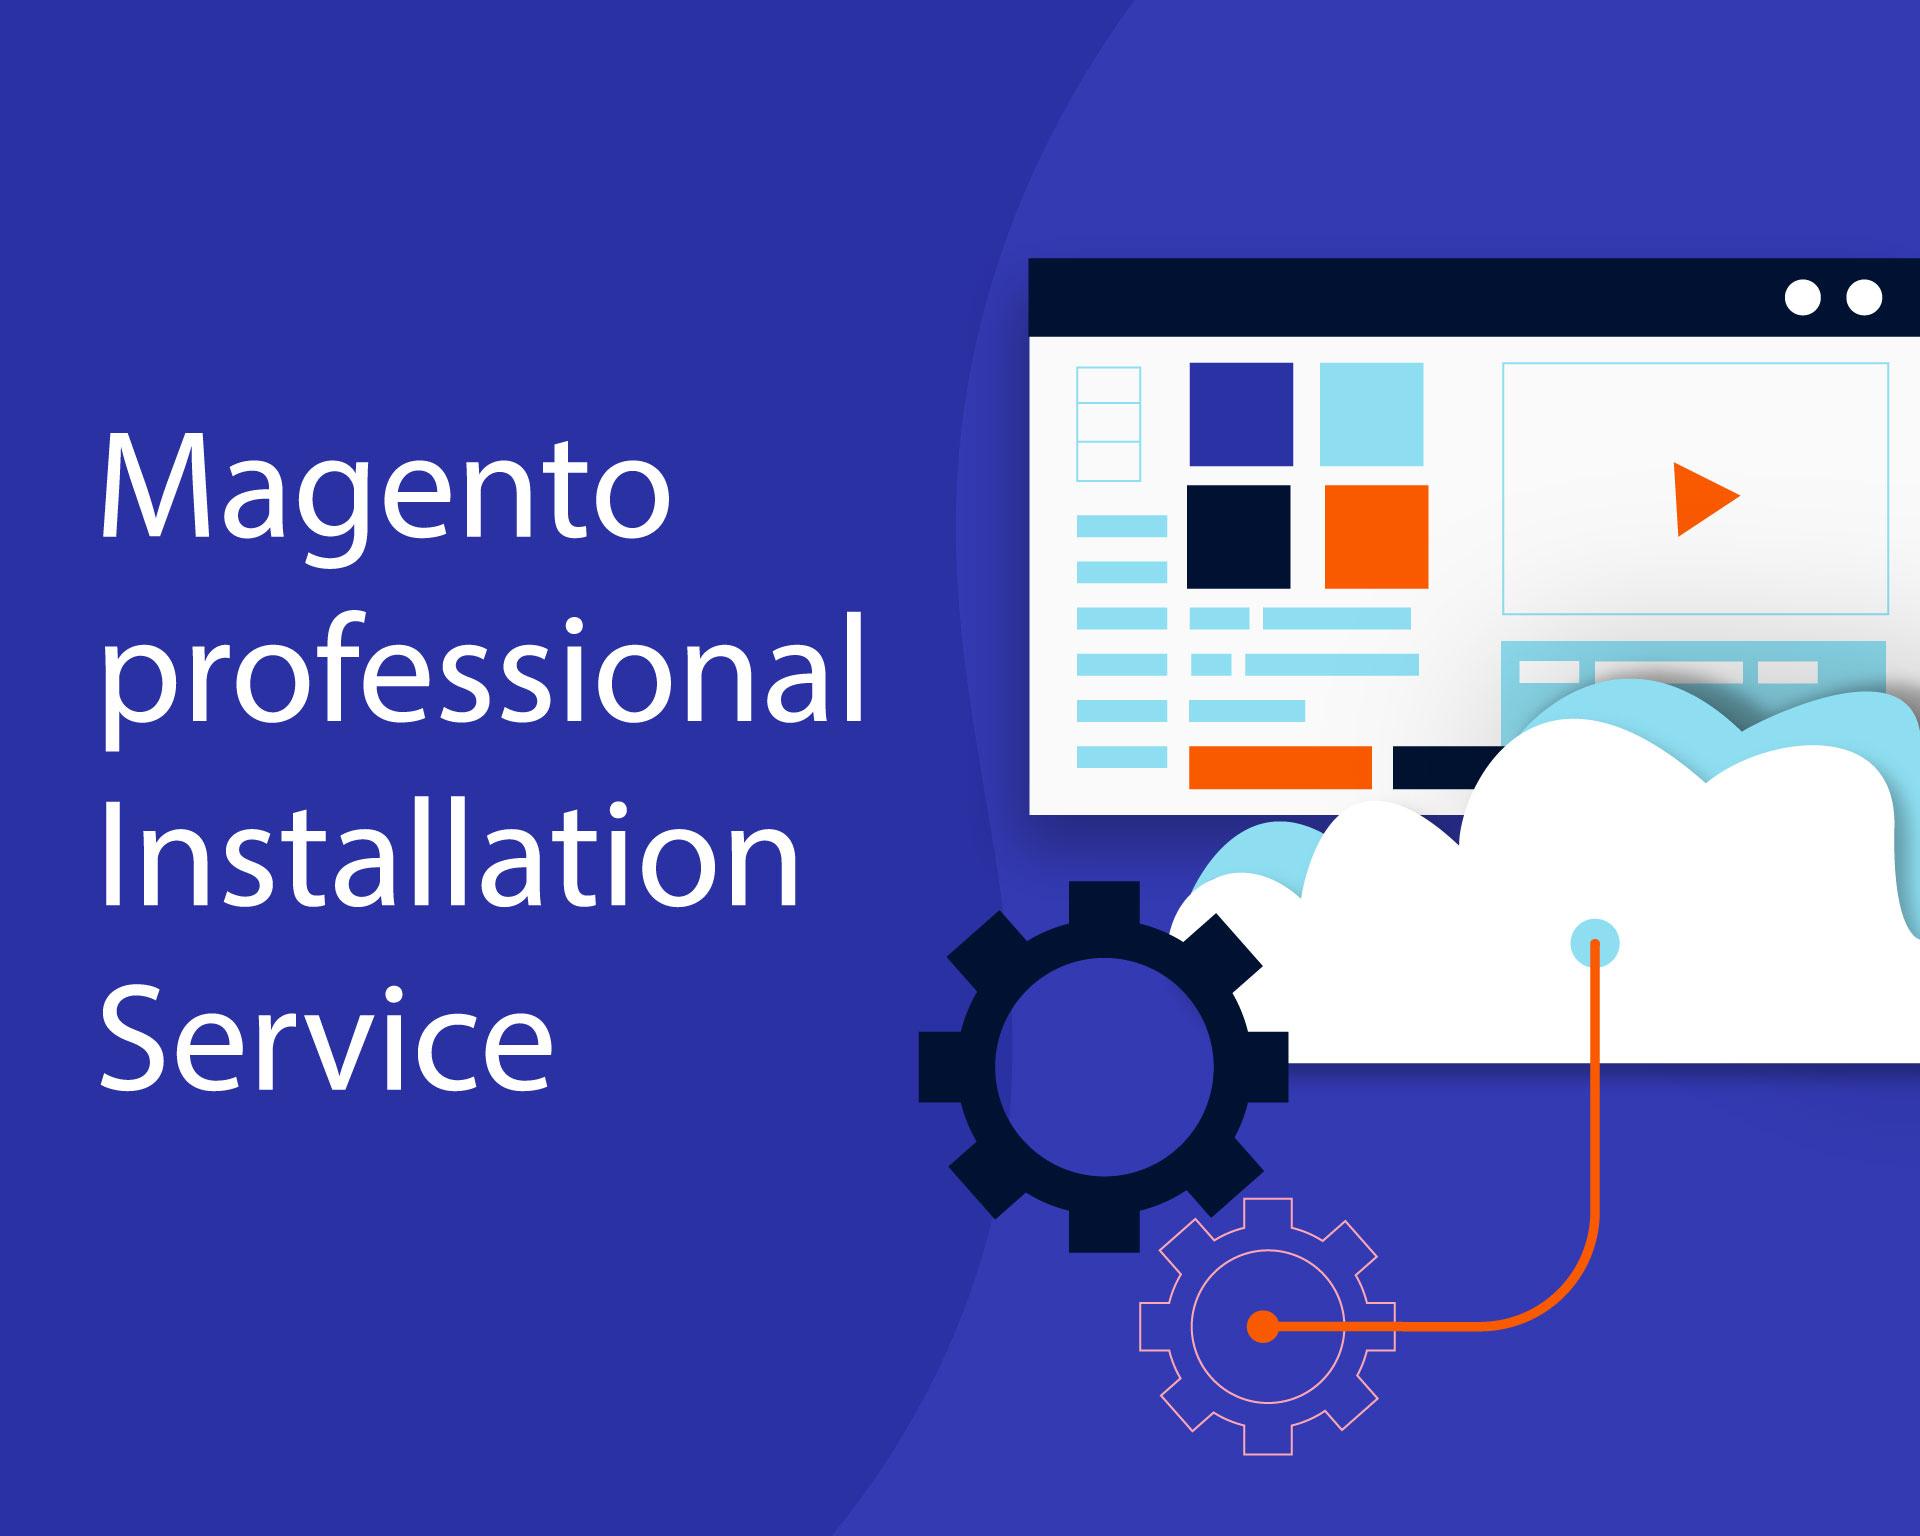 Magento Professional Installation Service